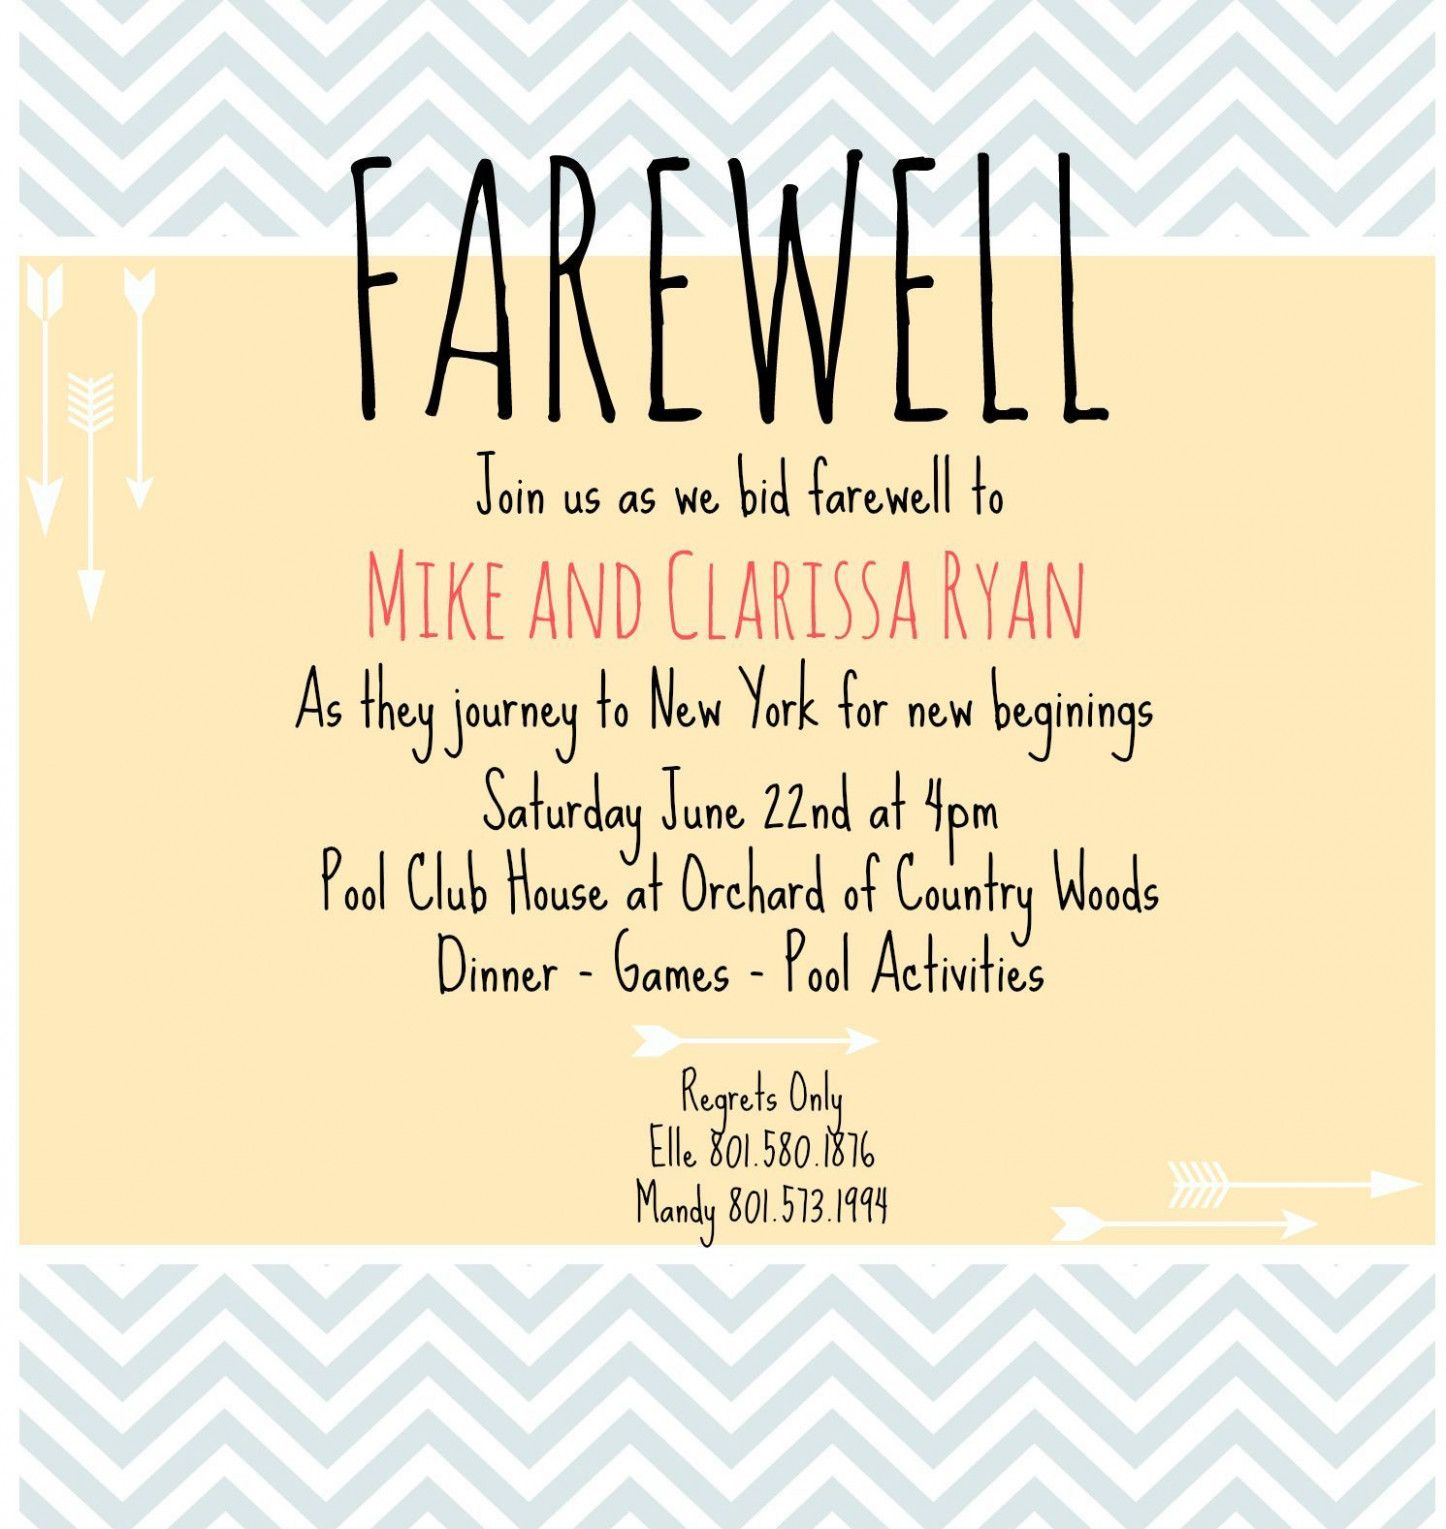 Invitation Card For Teachers On Farewell Party  Farewell party